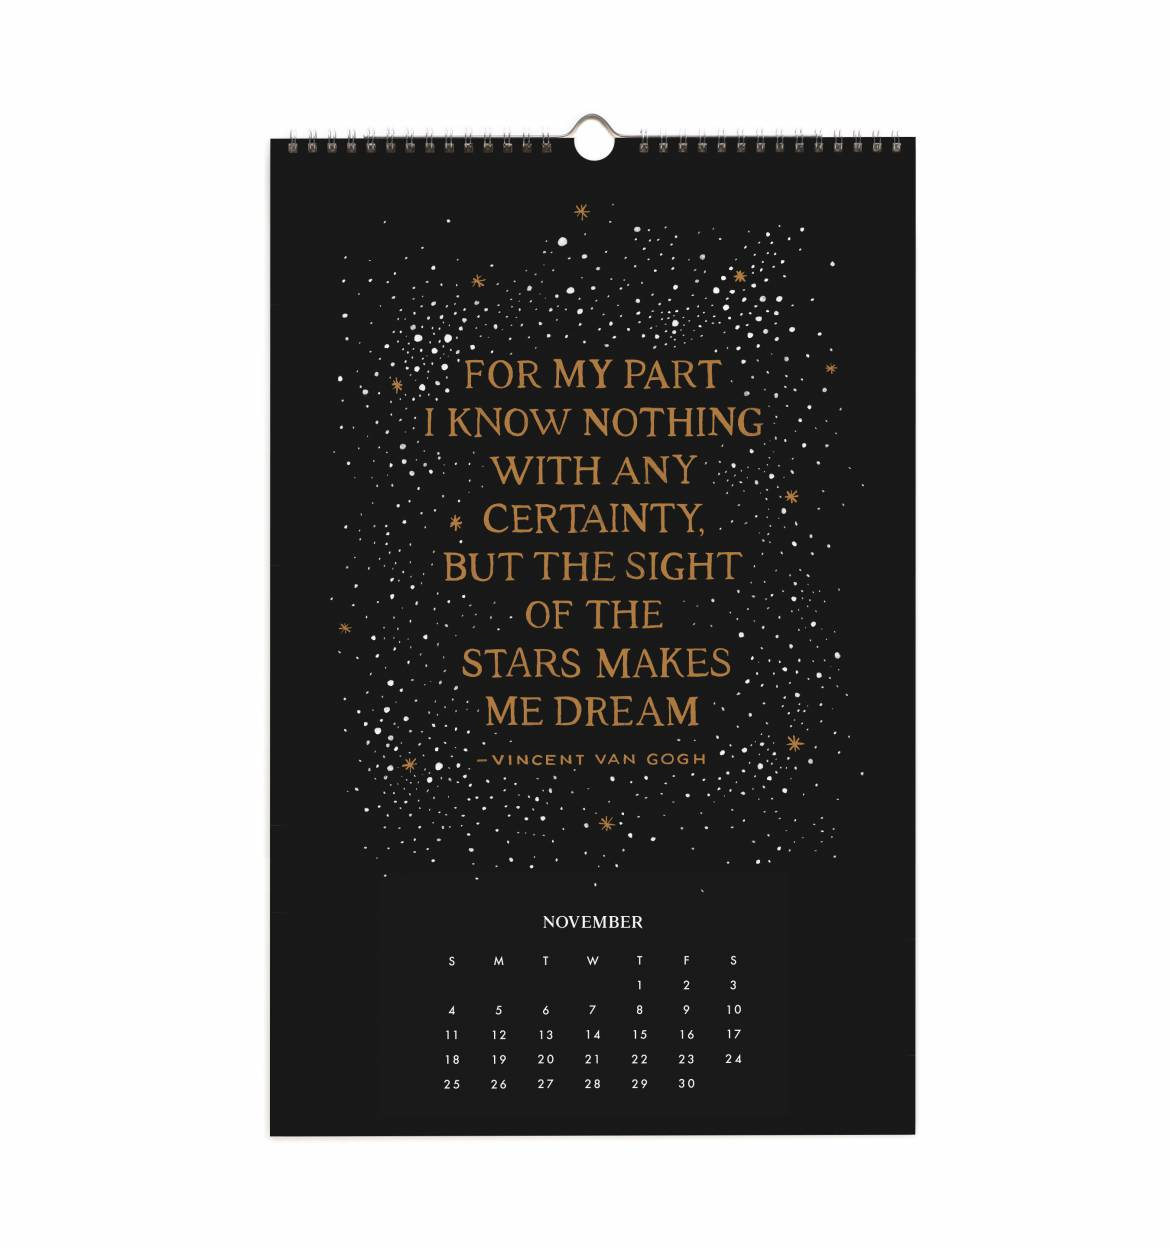 Trouva 2018 Inspirational Quotes Wall Calendar